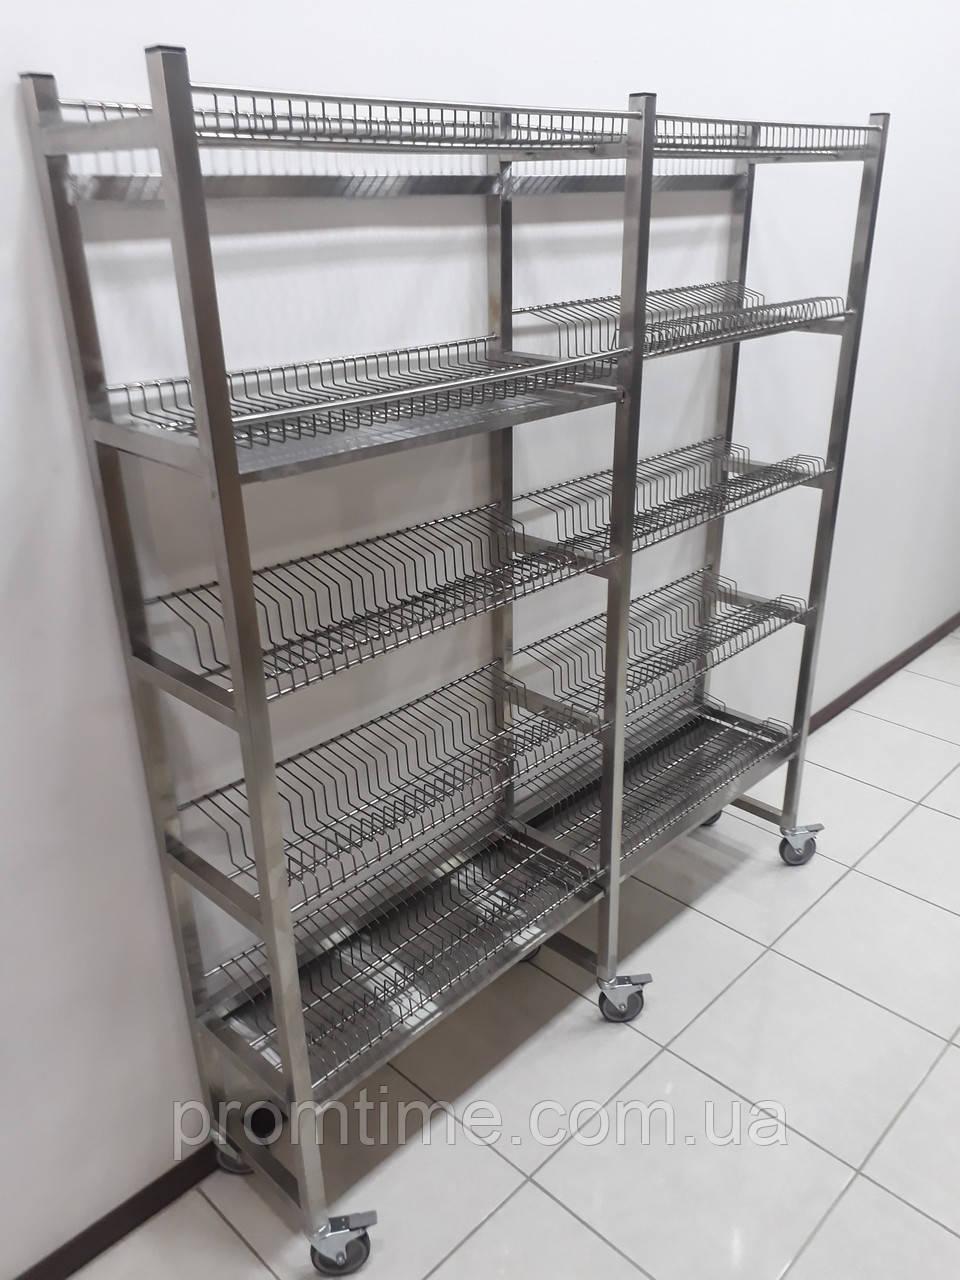 Стеллаж для сушки посуды на колесах 1600х320х1800